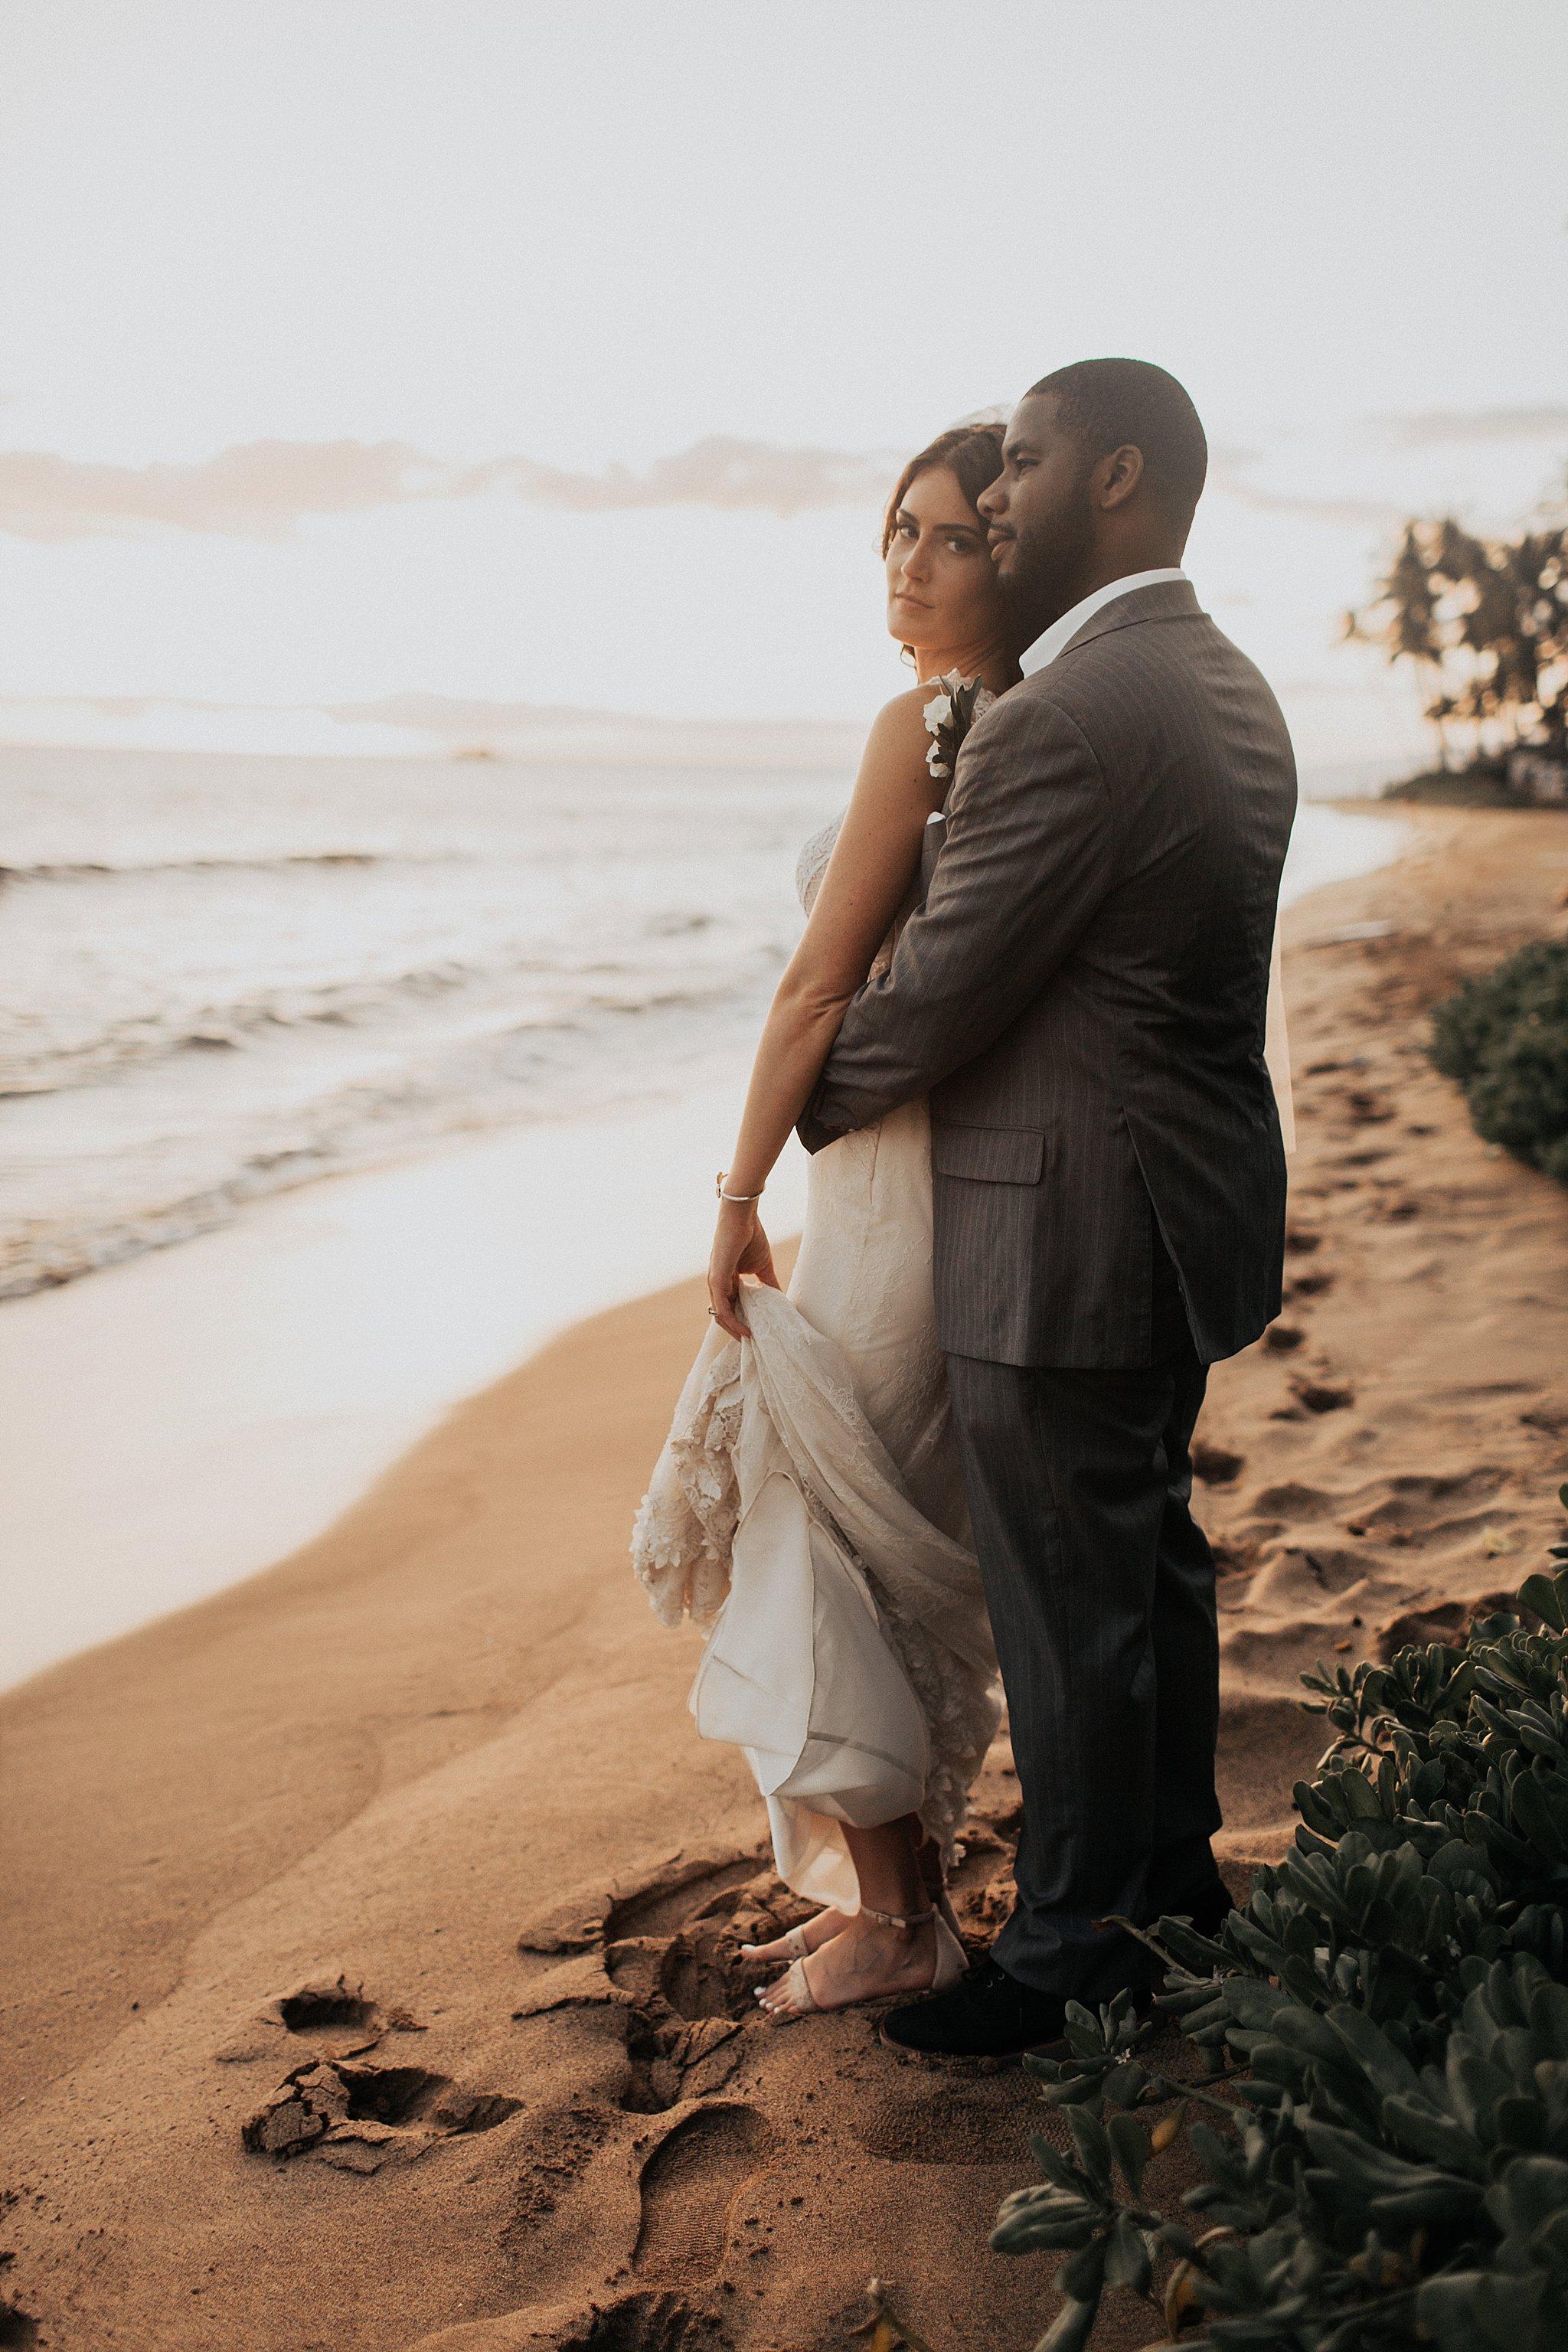 samantha_mcfarlen_bellingham_washington_engagement_photography_seattle_wedding_photographer_0268.jpg